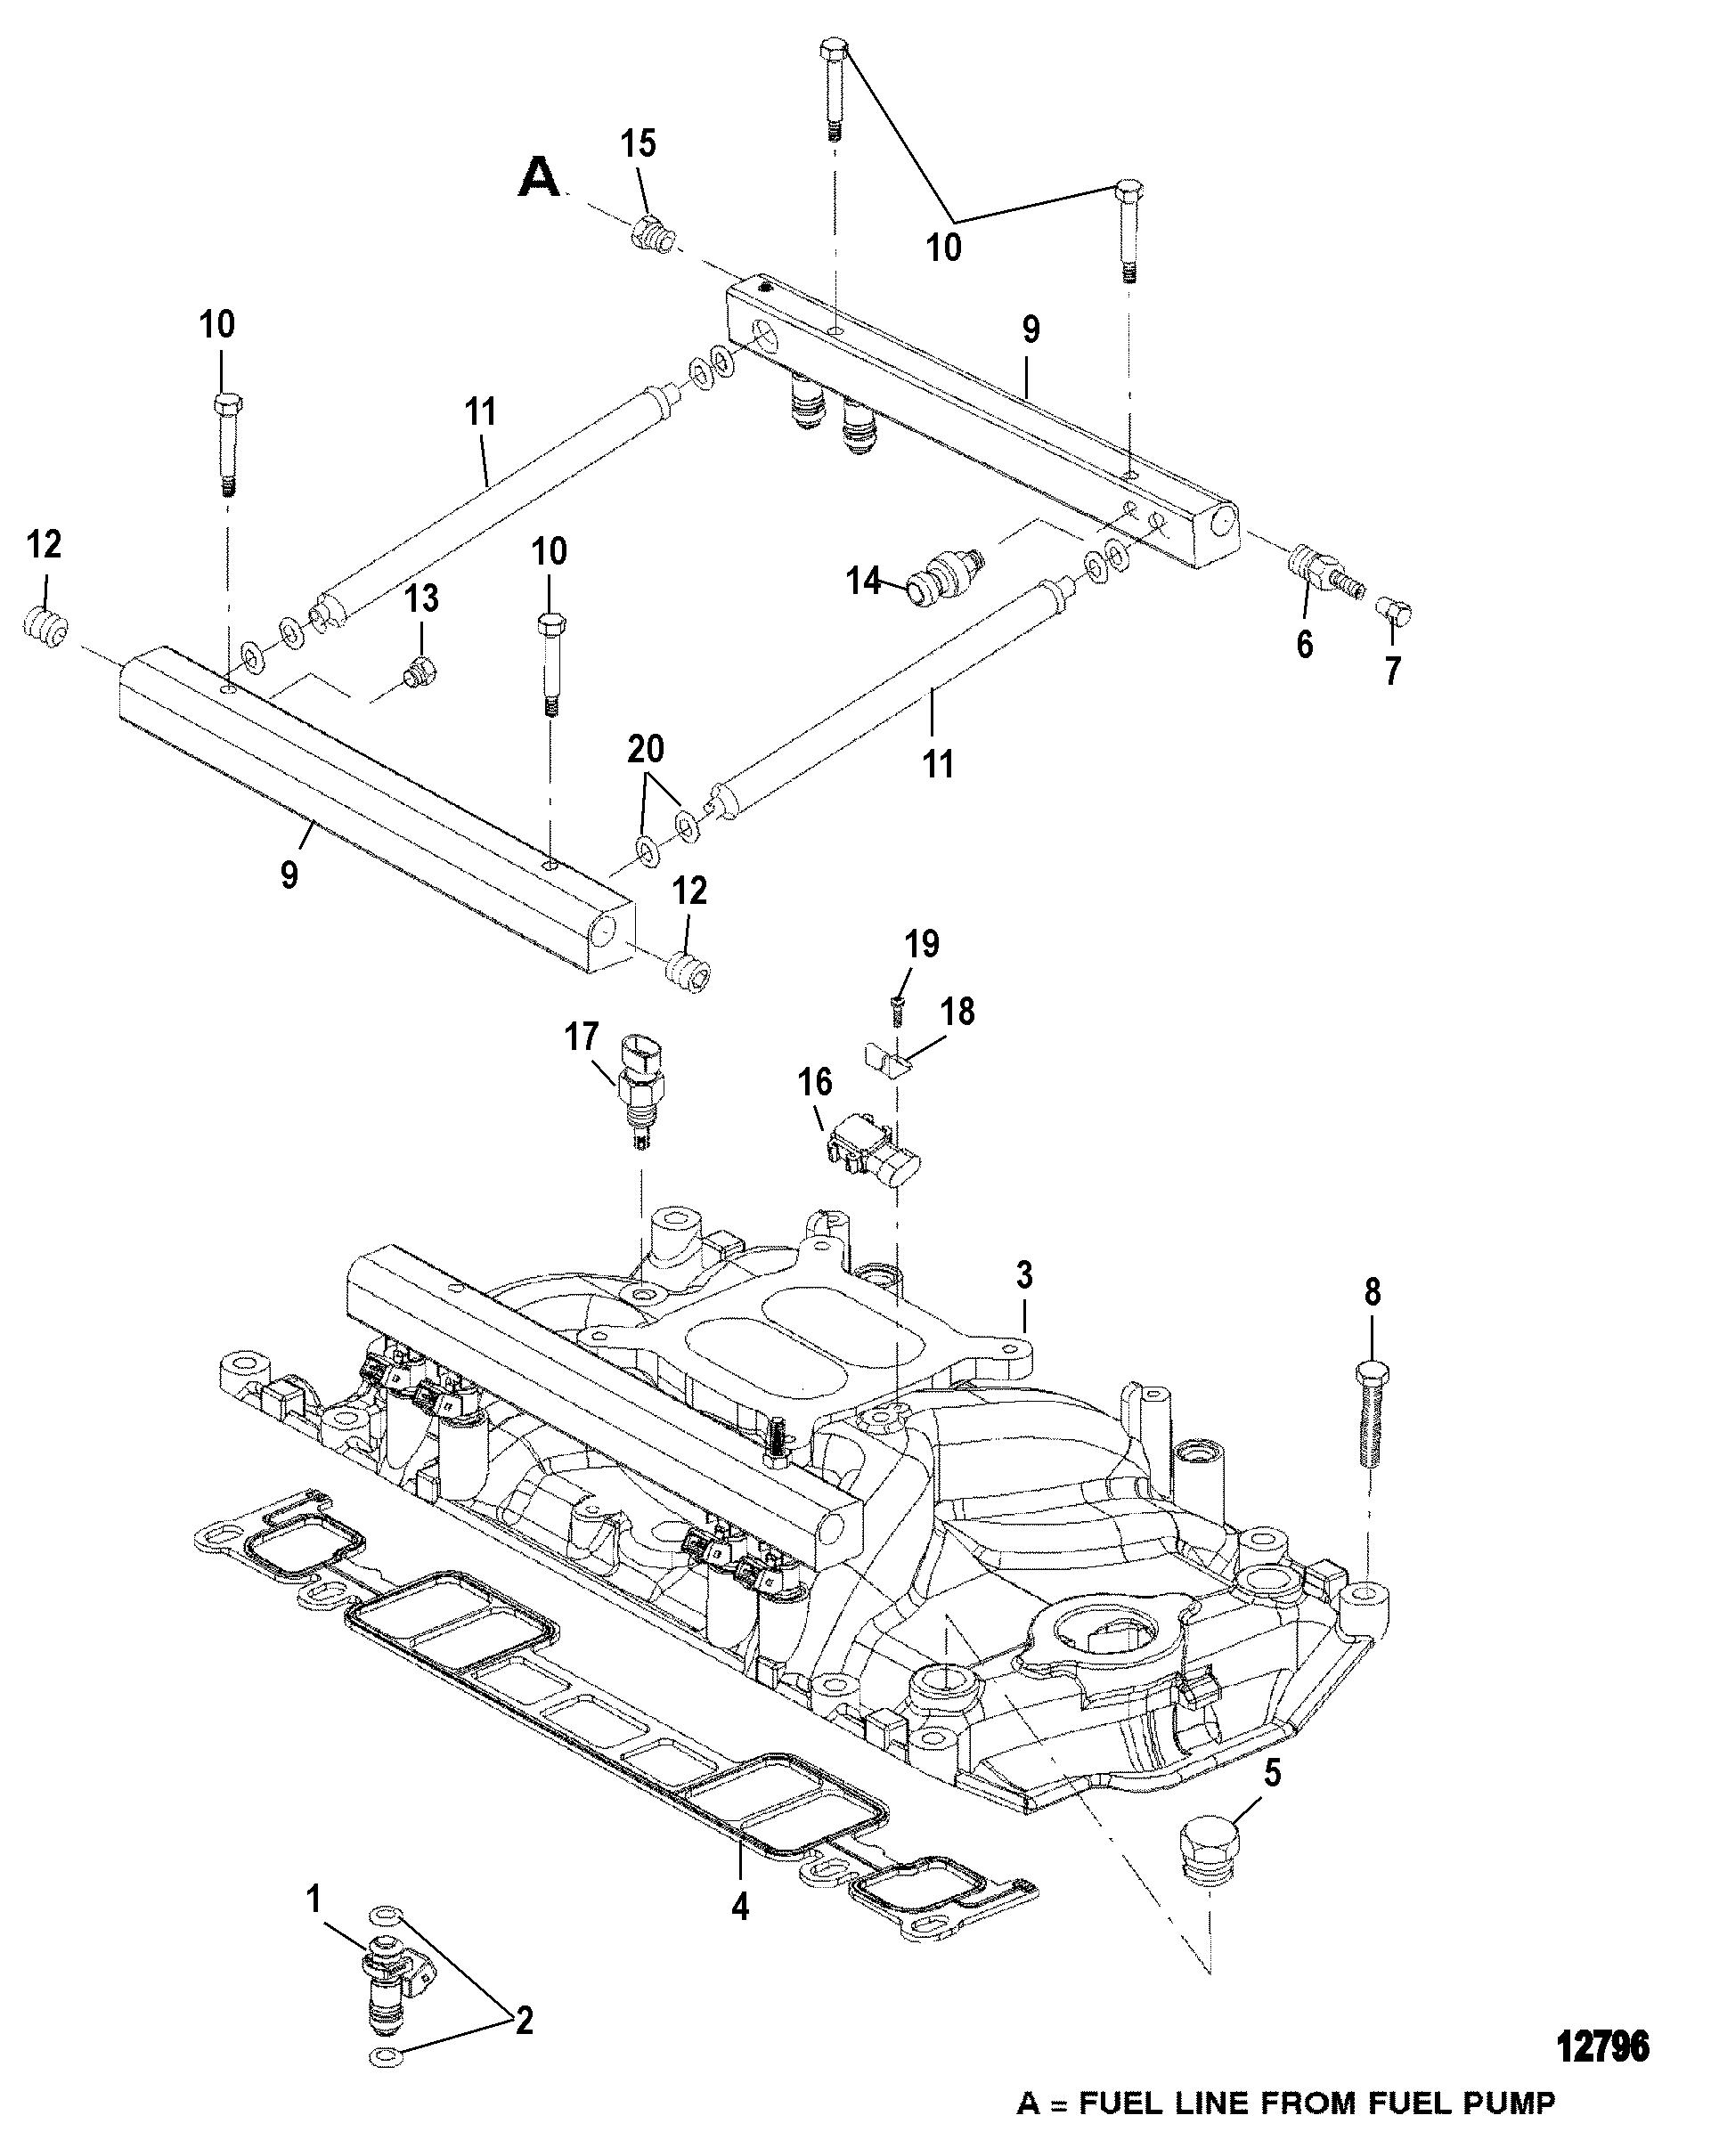 Fuel Injected 350 Mercruiser Engine Diagram Mercury Mag Mpi Alpha Bravo 0l331599 Thru Rh Vansoutboardparts Com Pump Trim